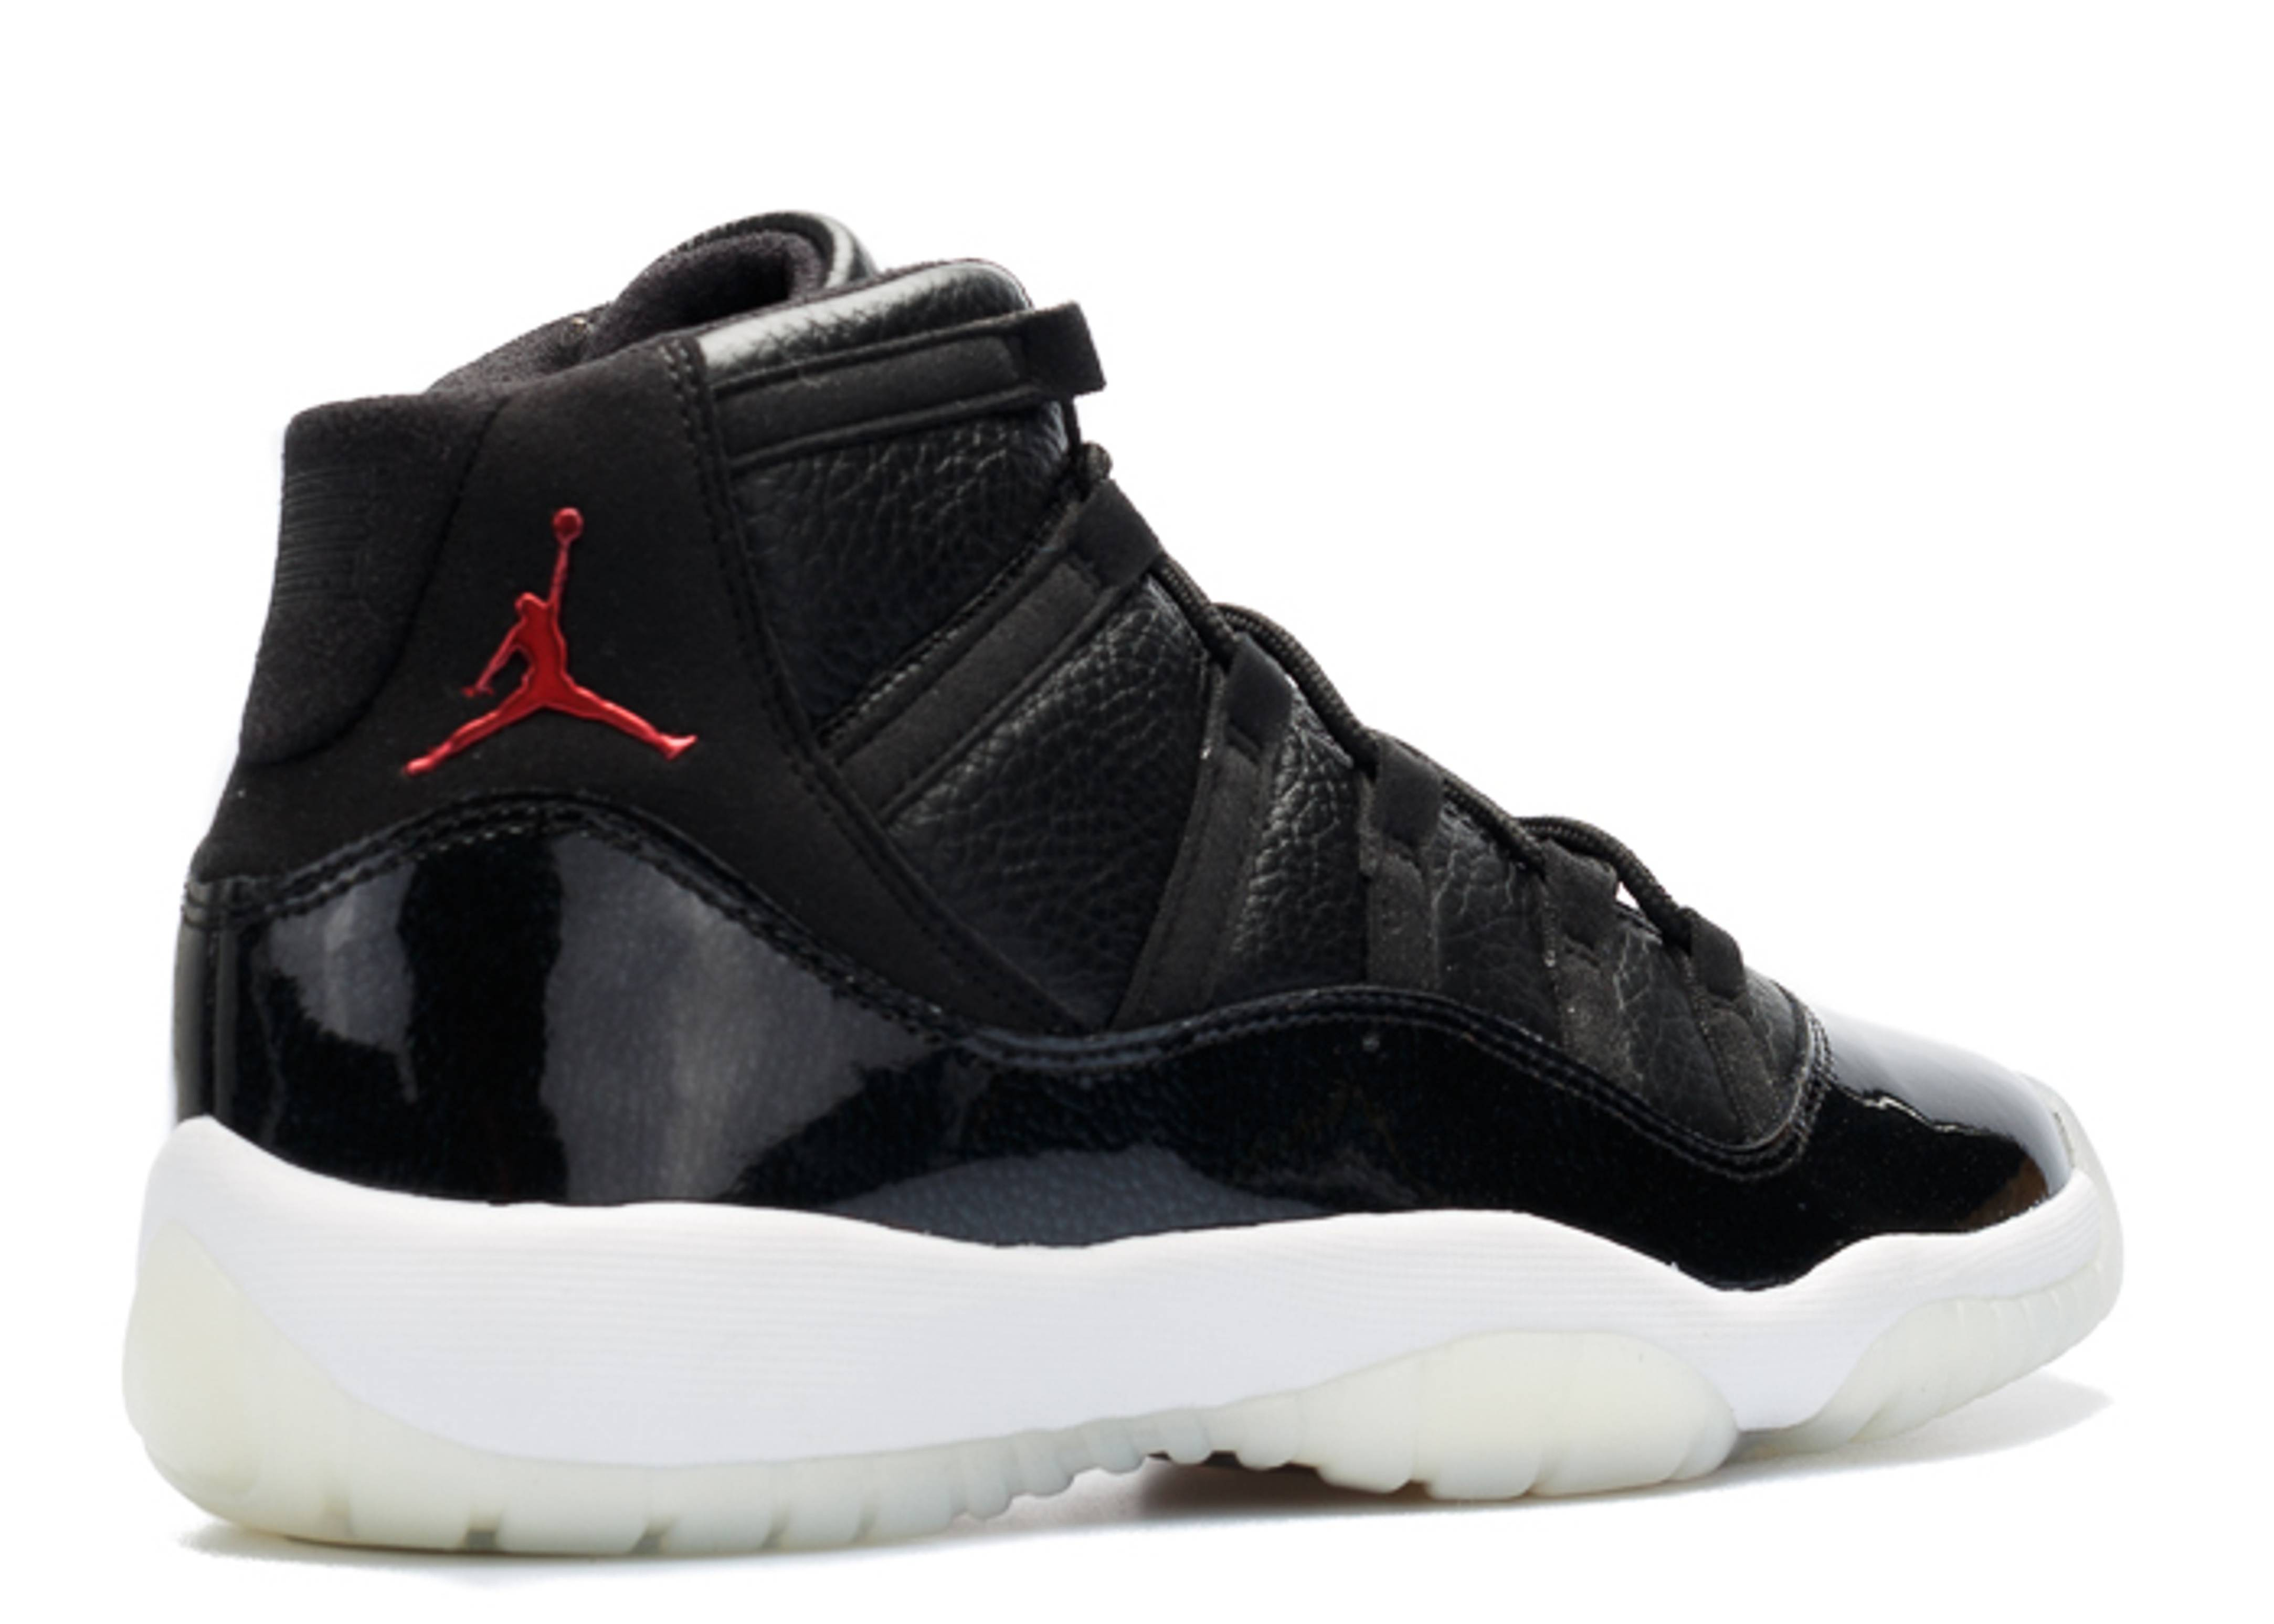 Jordan Retro 11: Air Jordan 11 Retro Bg (gs) Black/gym Red-white-anthracite